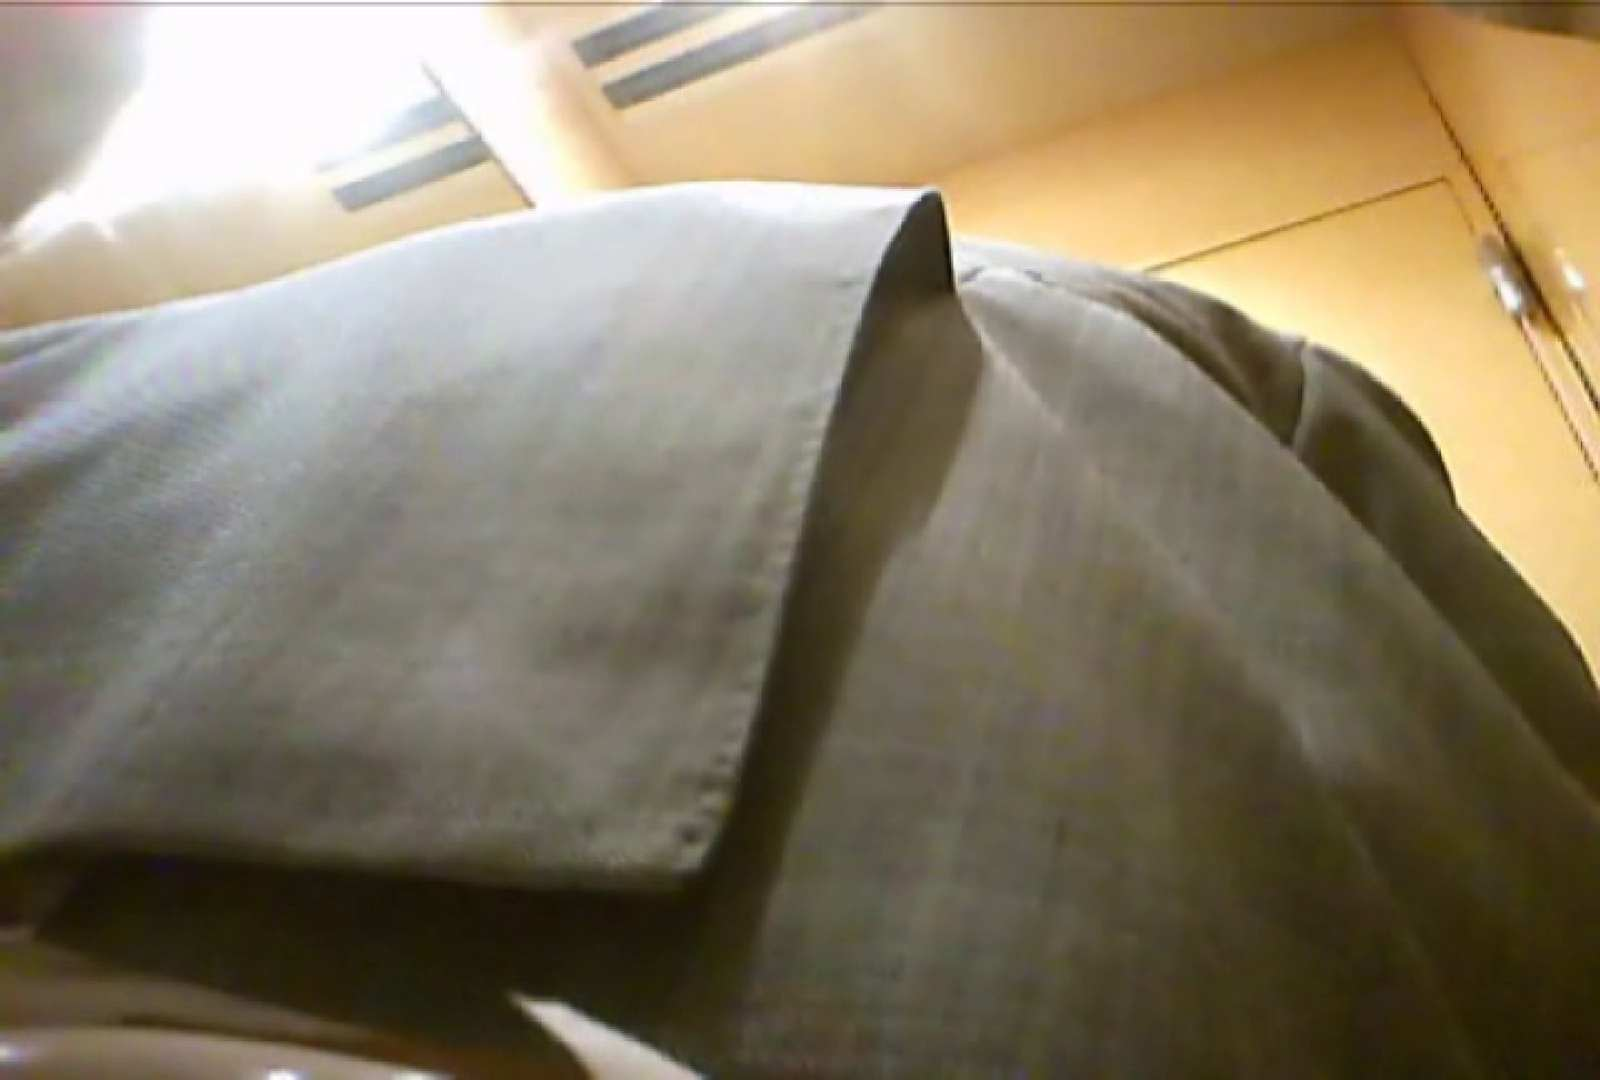 SEASON 2ND!掴み取りさんの洗面所覗き!in新幹線!VOL.02 スーツボーイズ | ノンケボーイズ  82pic 38